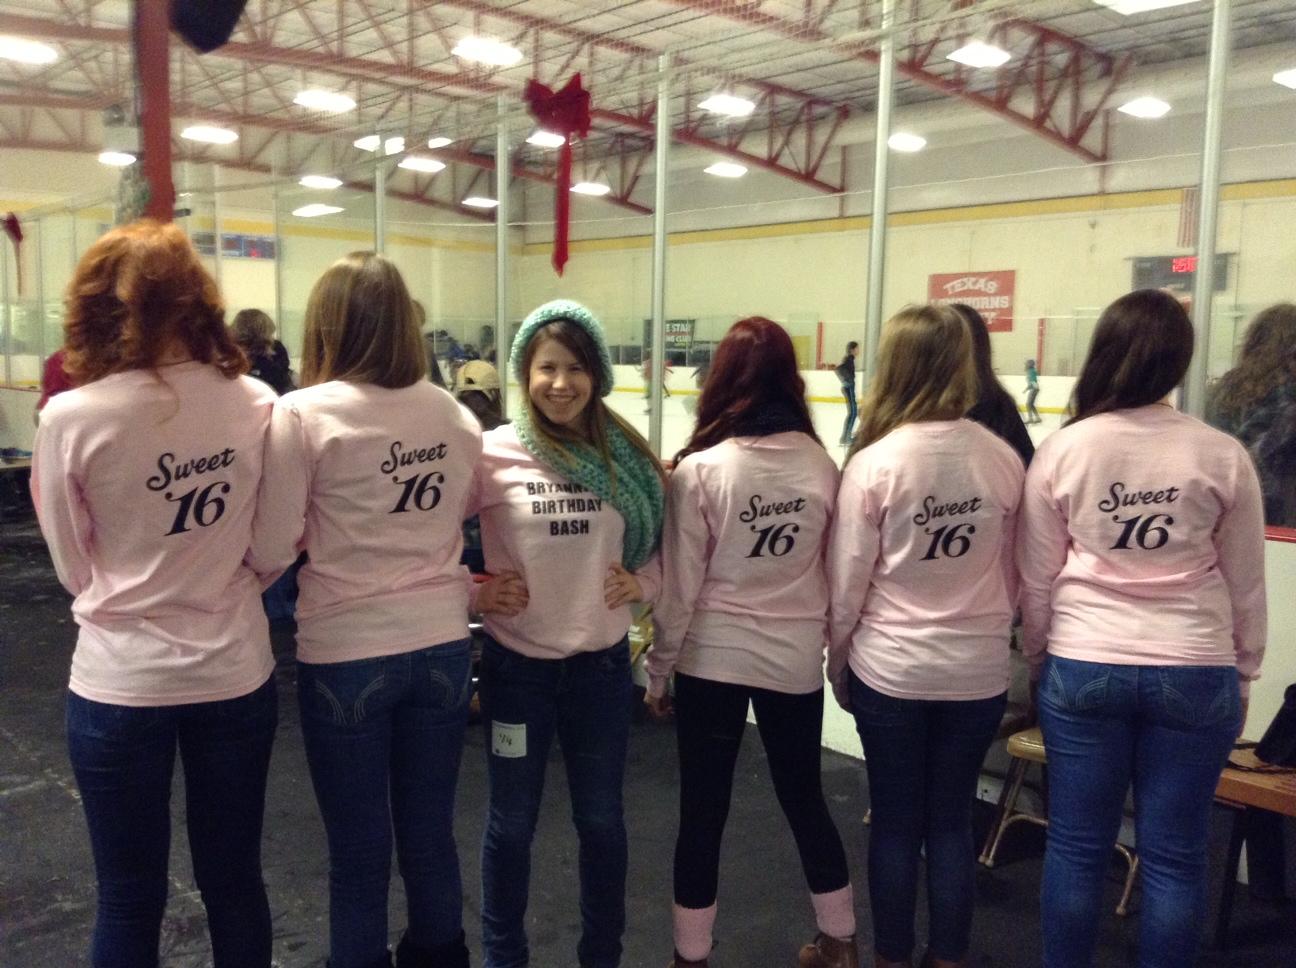 Design your own t-shirt birthday party - Bryanna S 16th Birthday Bash T Shirt Photo